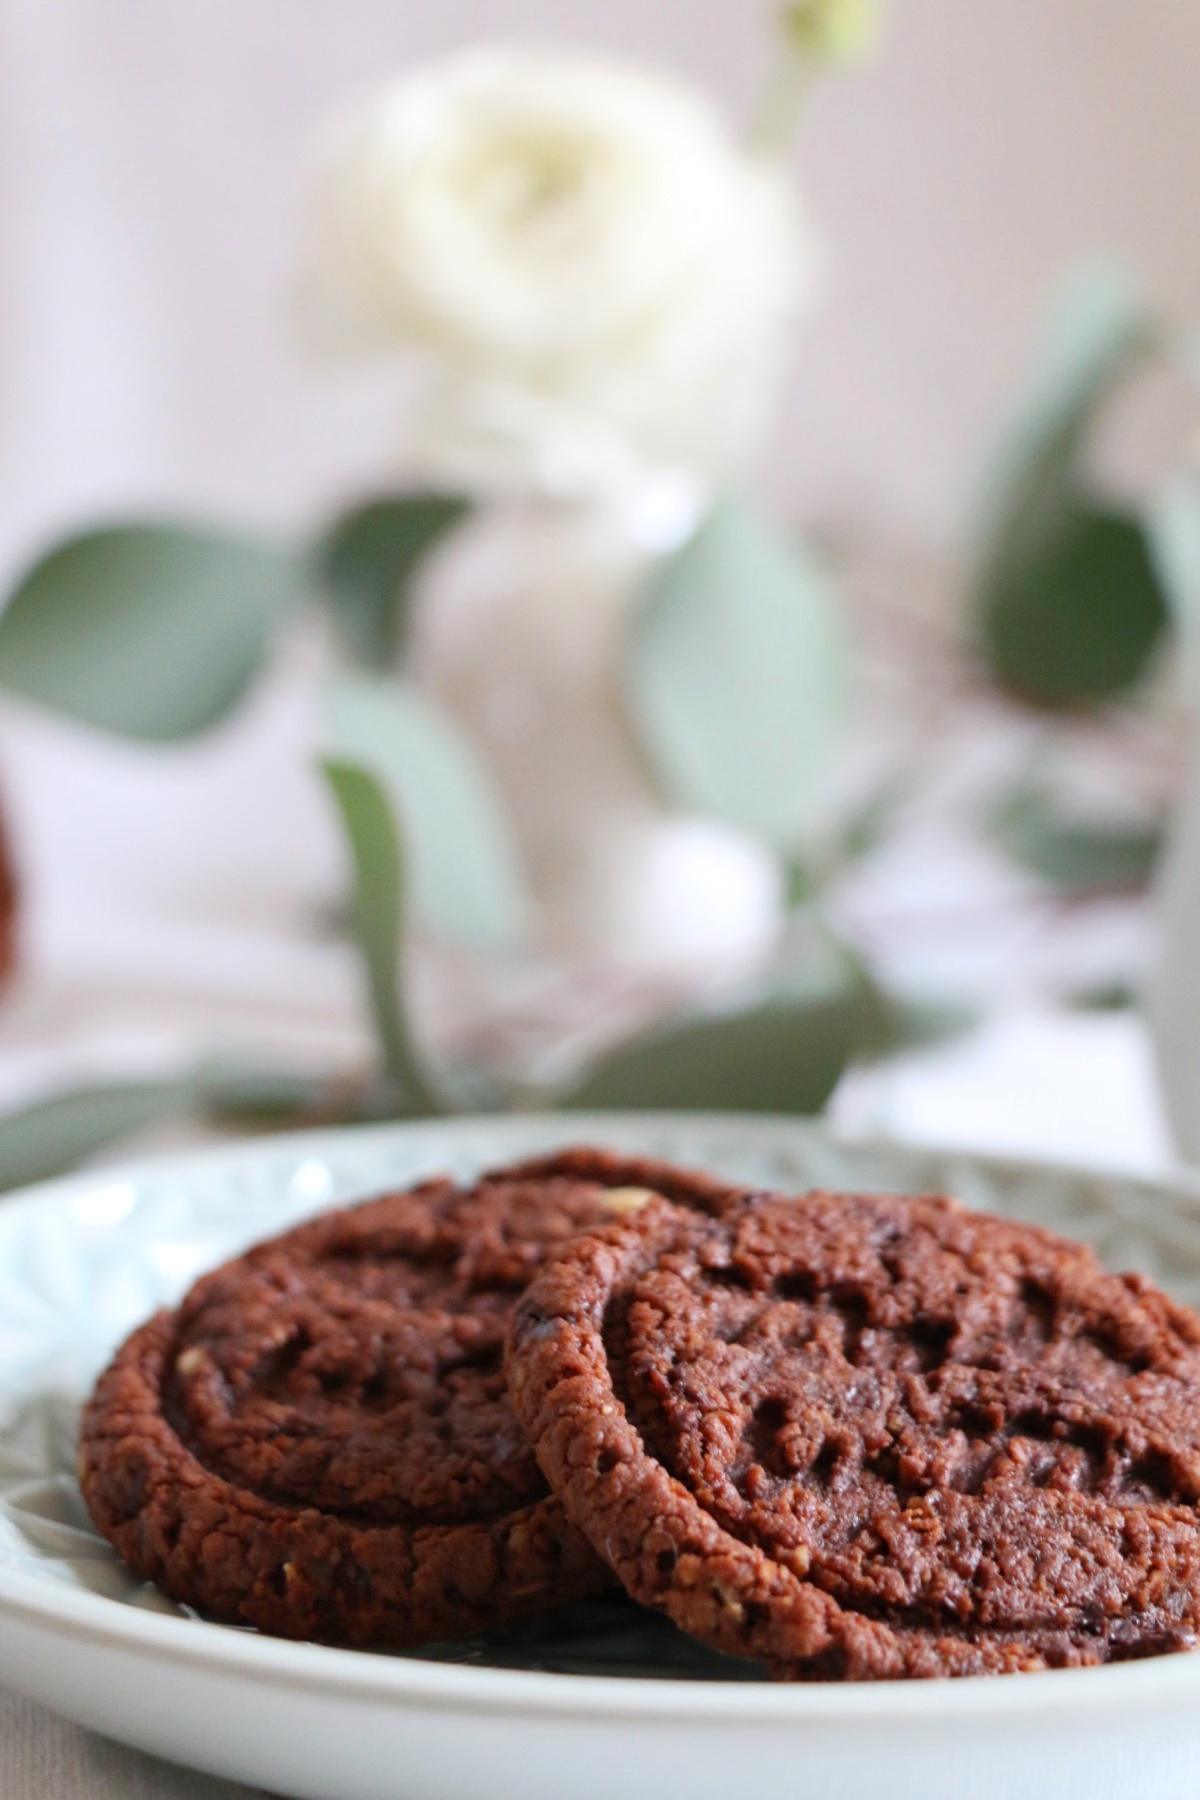 Chocolate-Almond-Liquorice Cookies by eat blog love